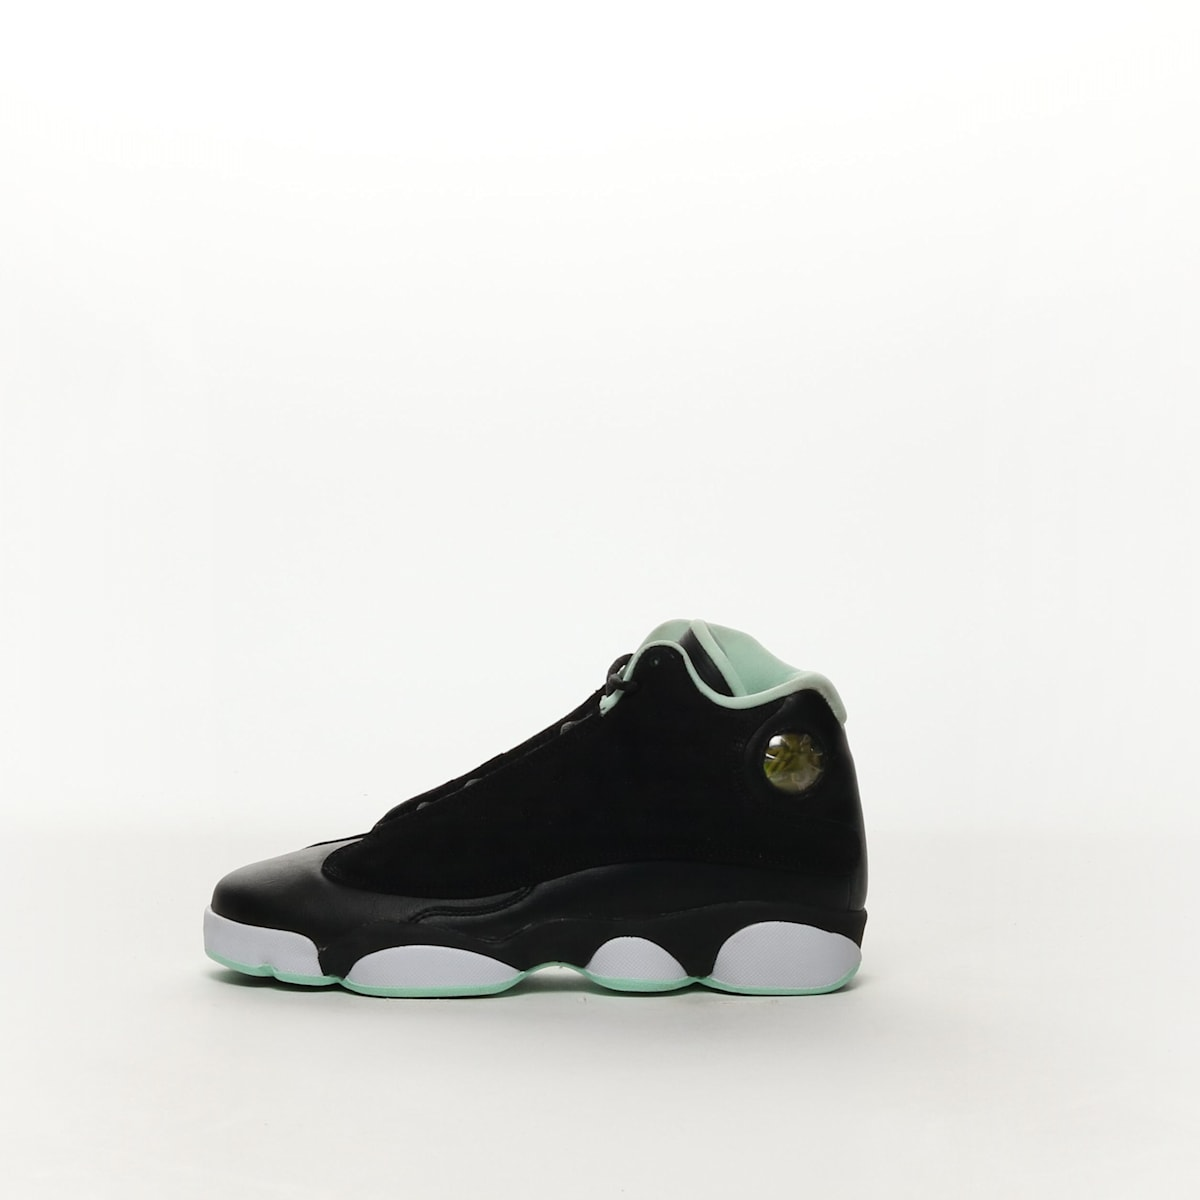 a80a9373bc9 Girls' Air Jordan 13 Retro (GS) Shoe - BLACK/METALLIC GOLD-MINT FOAM ...